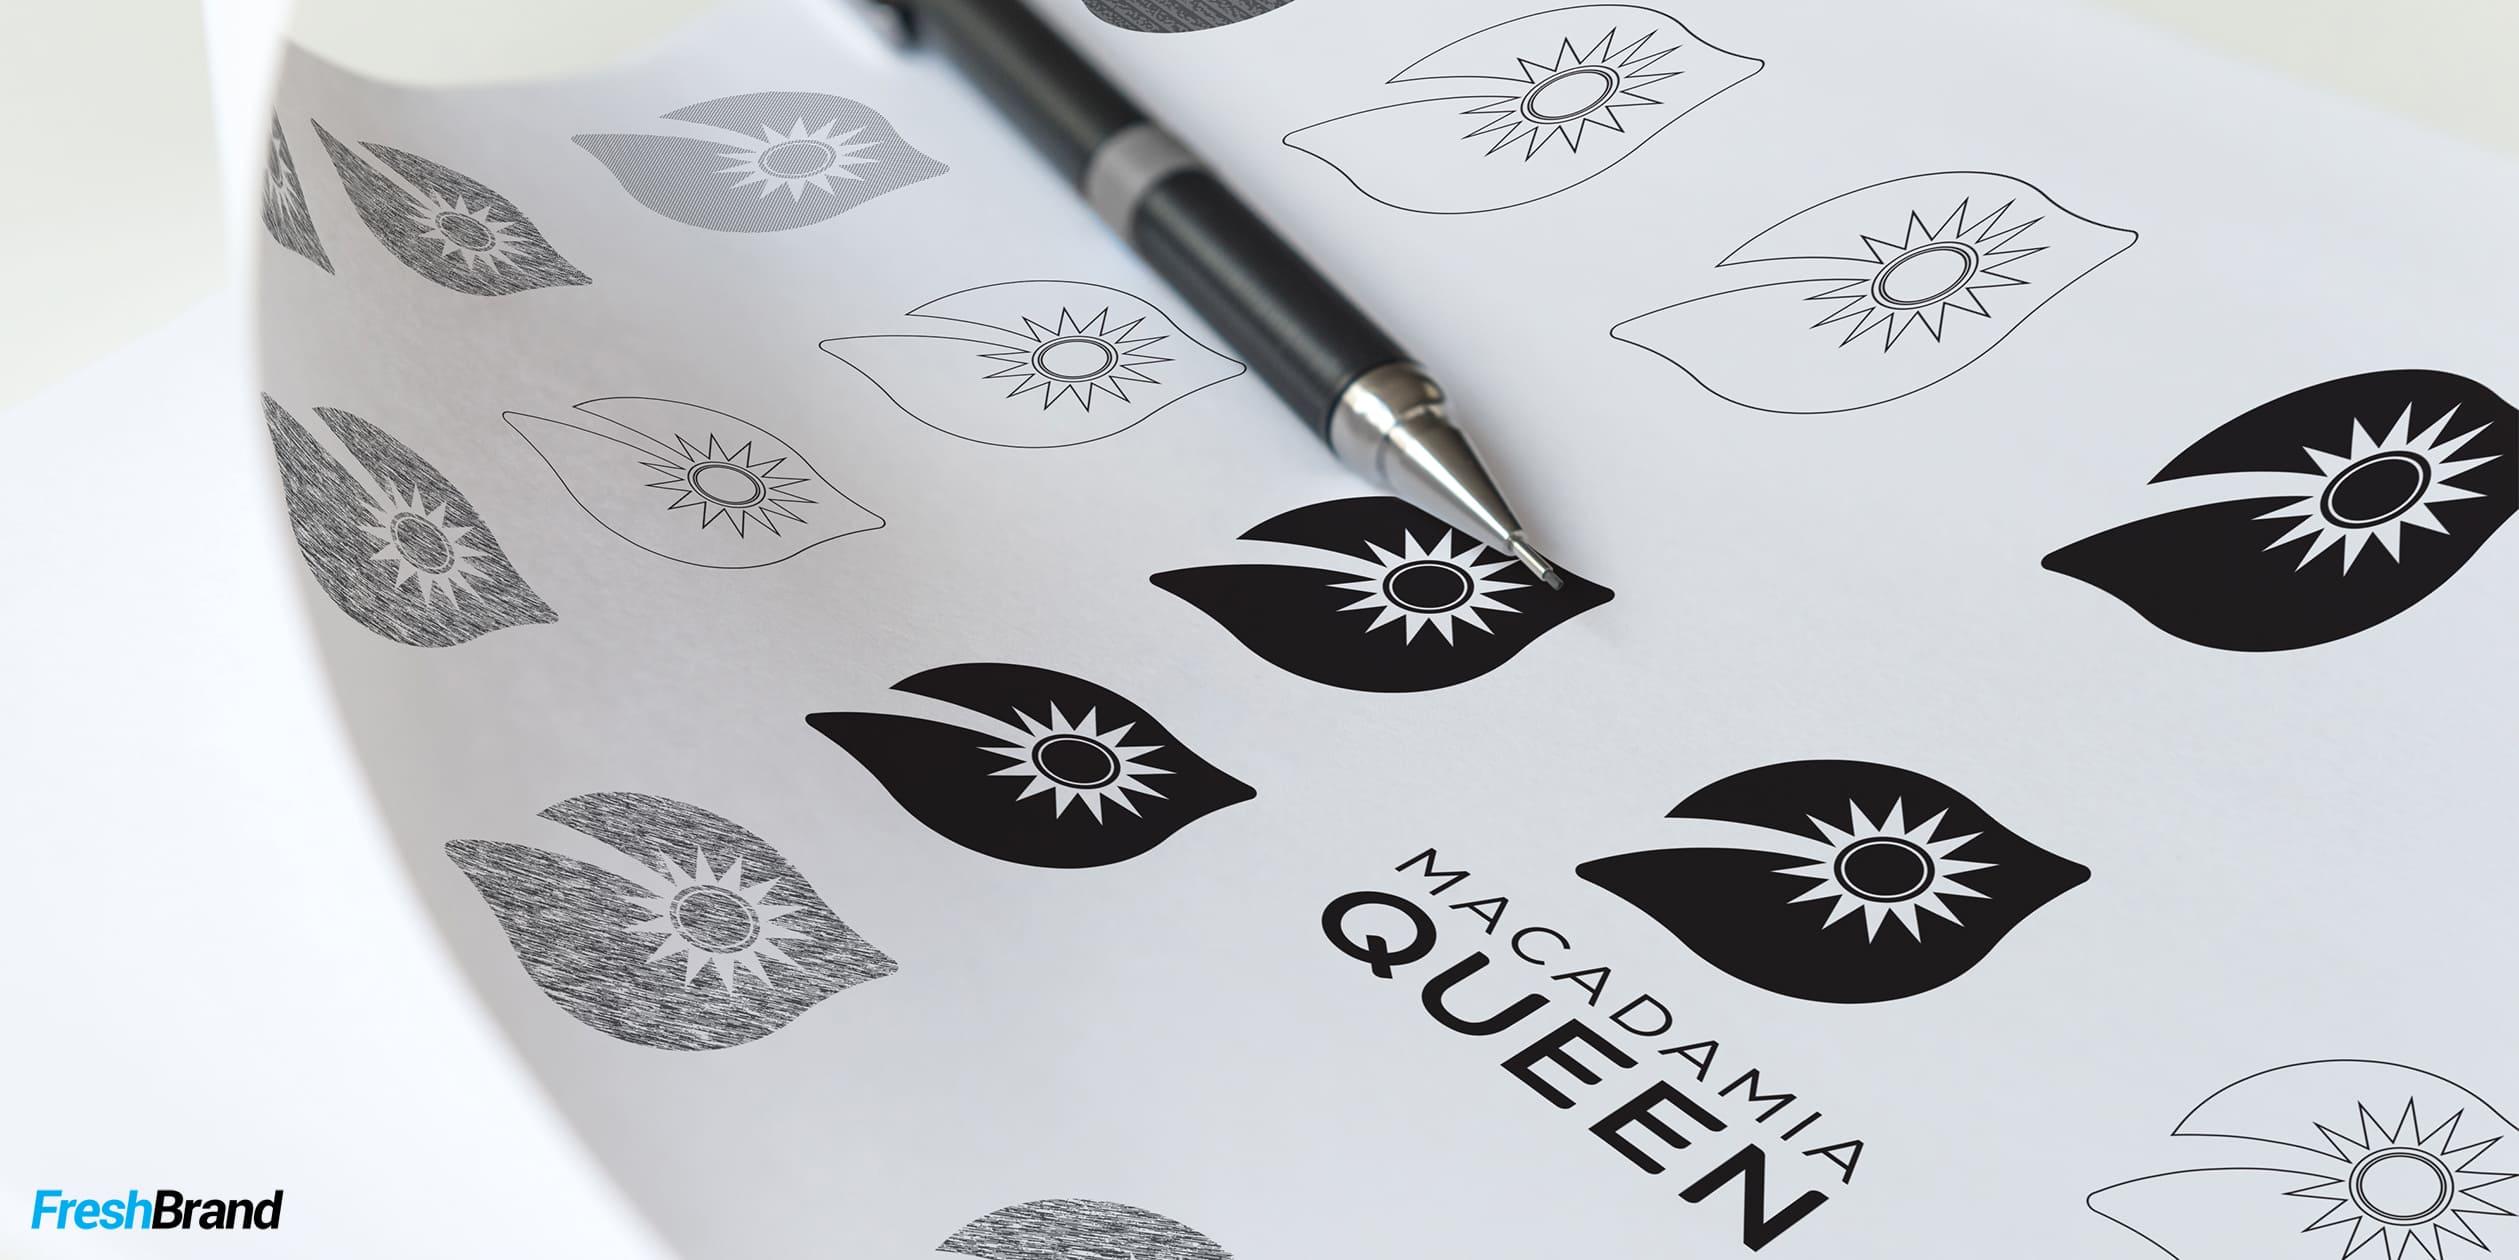 Thiết kế logo Macadamia Queen